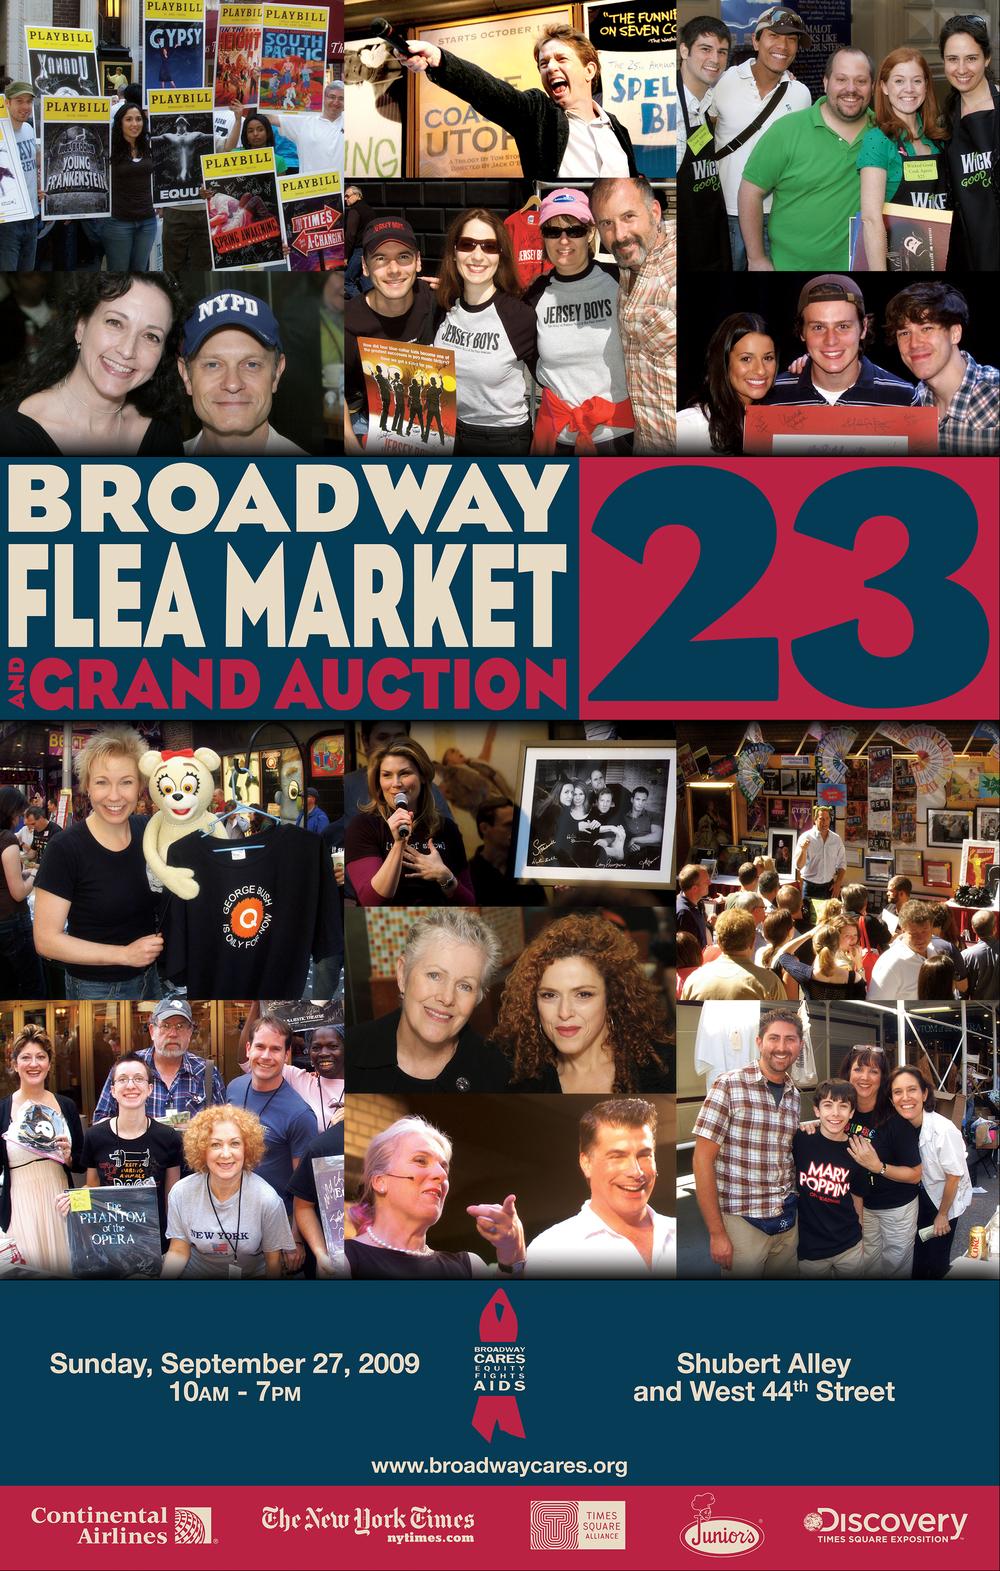 Broadway Flea Market 23 Poster